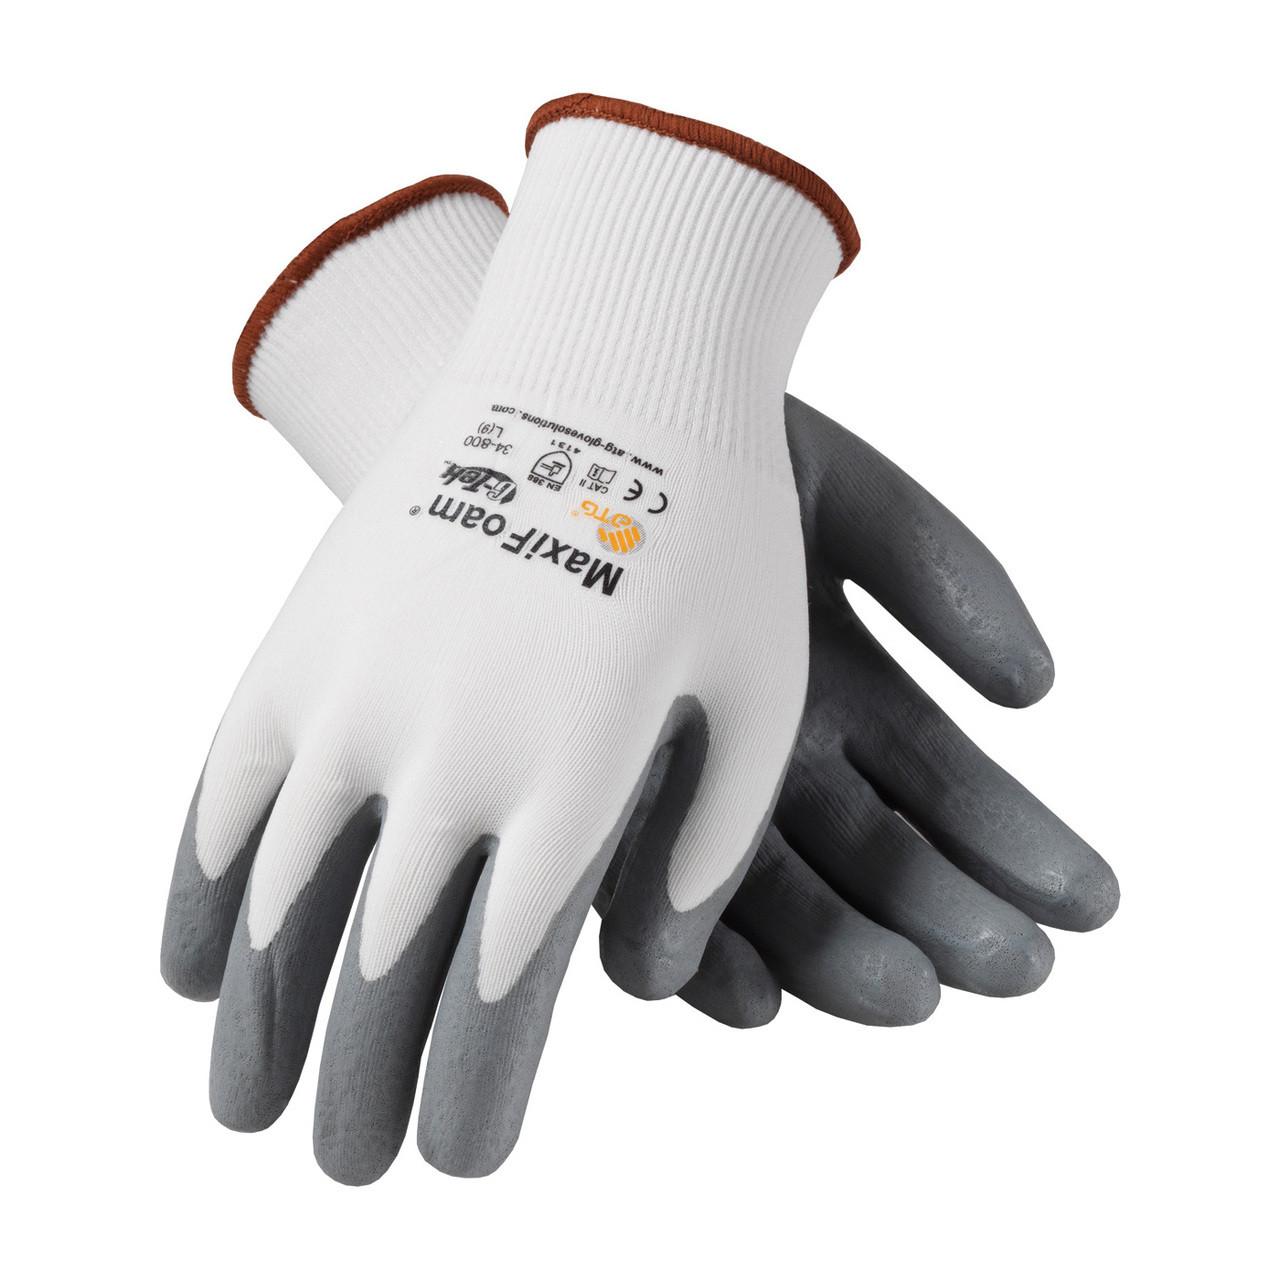 MaxiFoam 34-800 White Glove with Nitrile Coated Foam Grip (Pair)